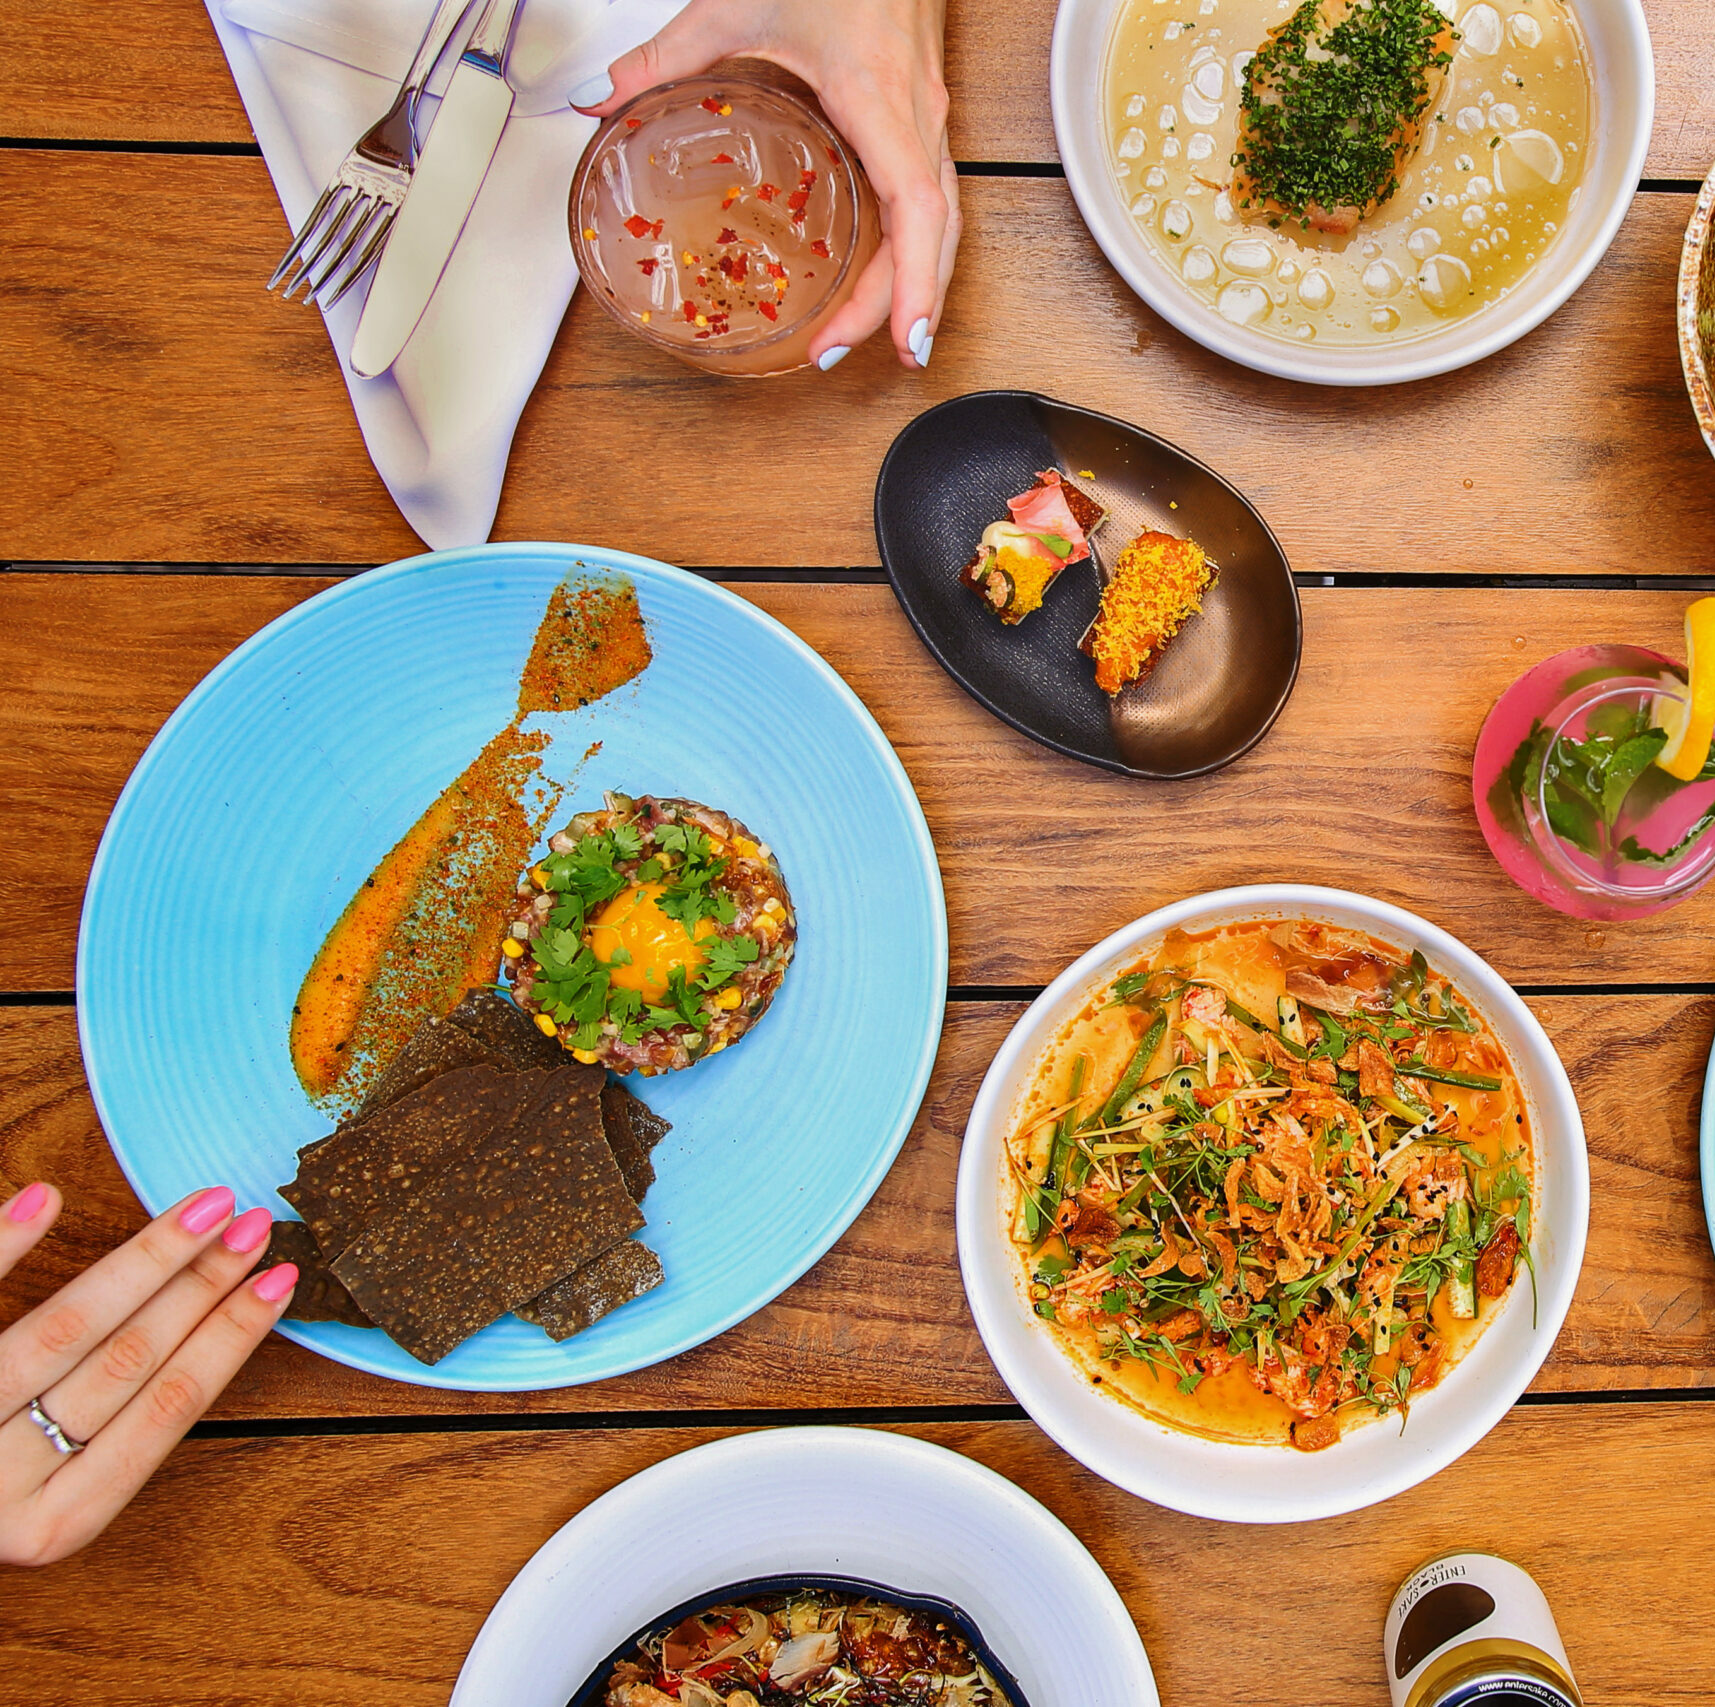 Izakaya Residency at Lido Bayside Grill